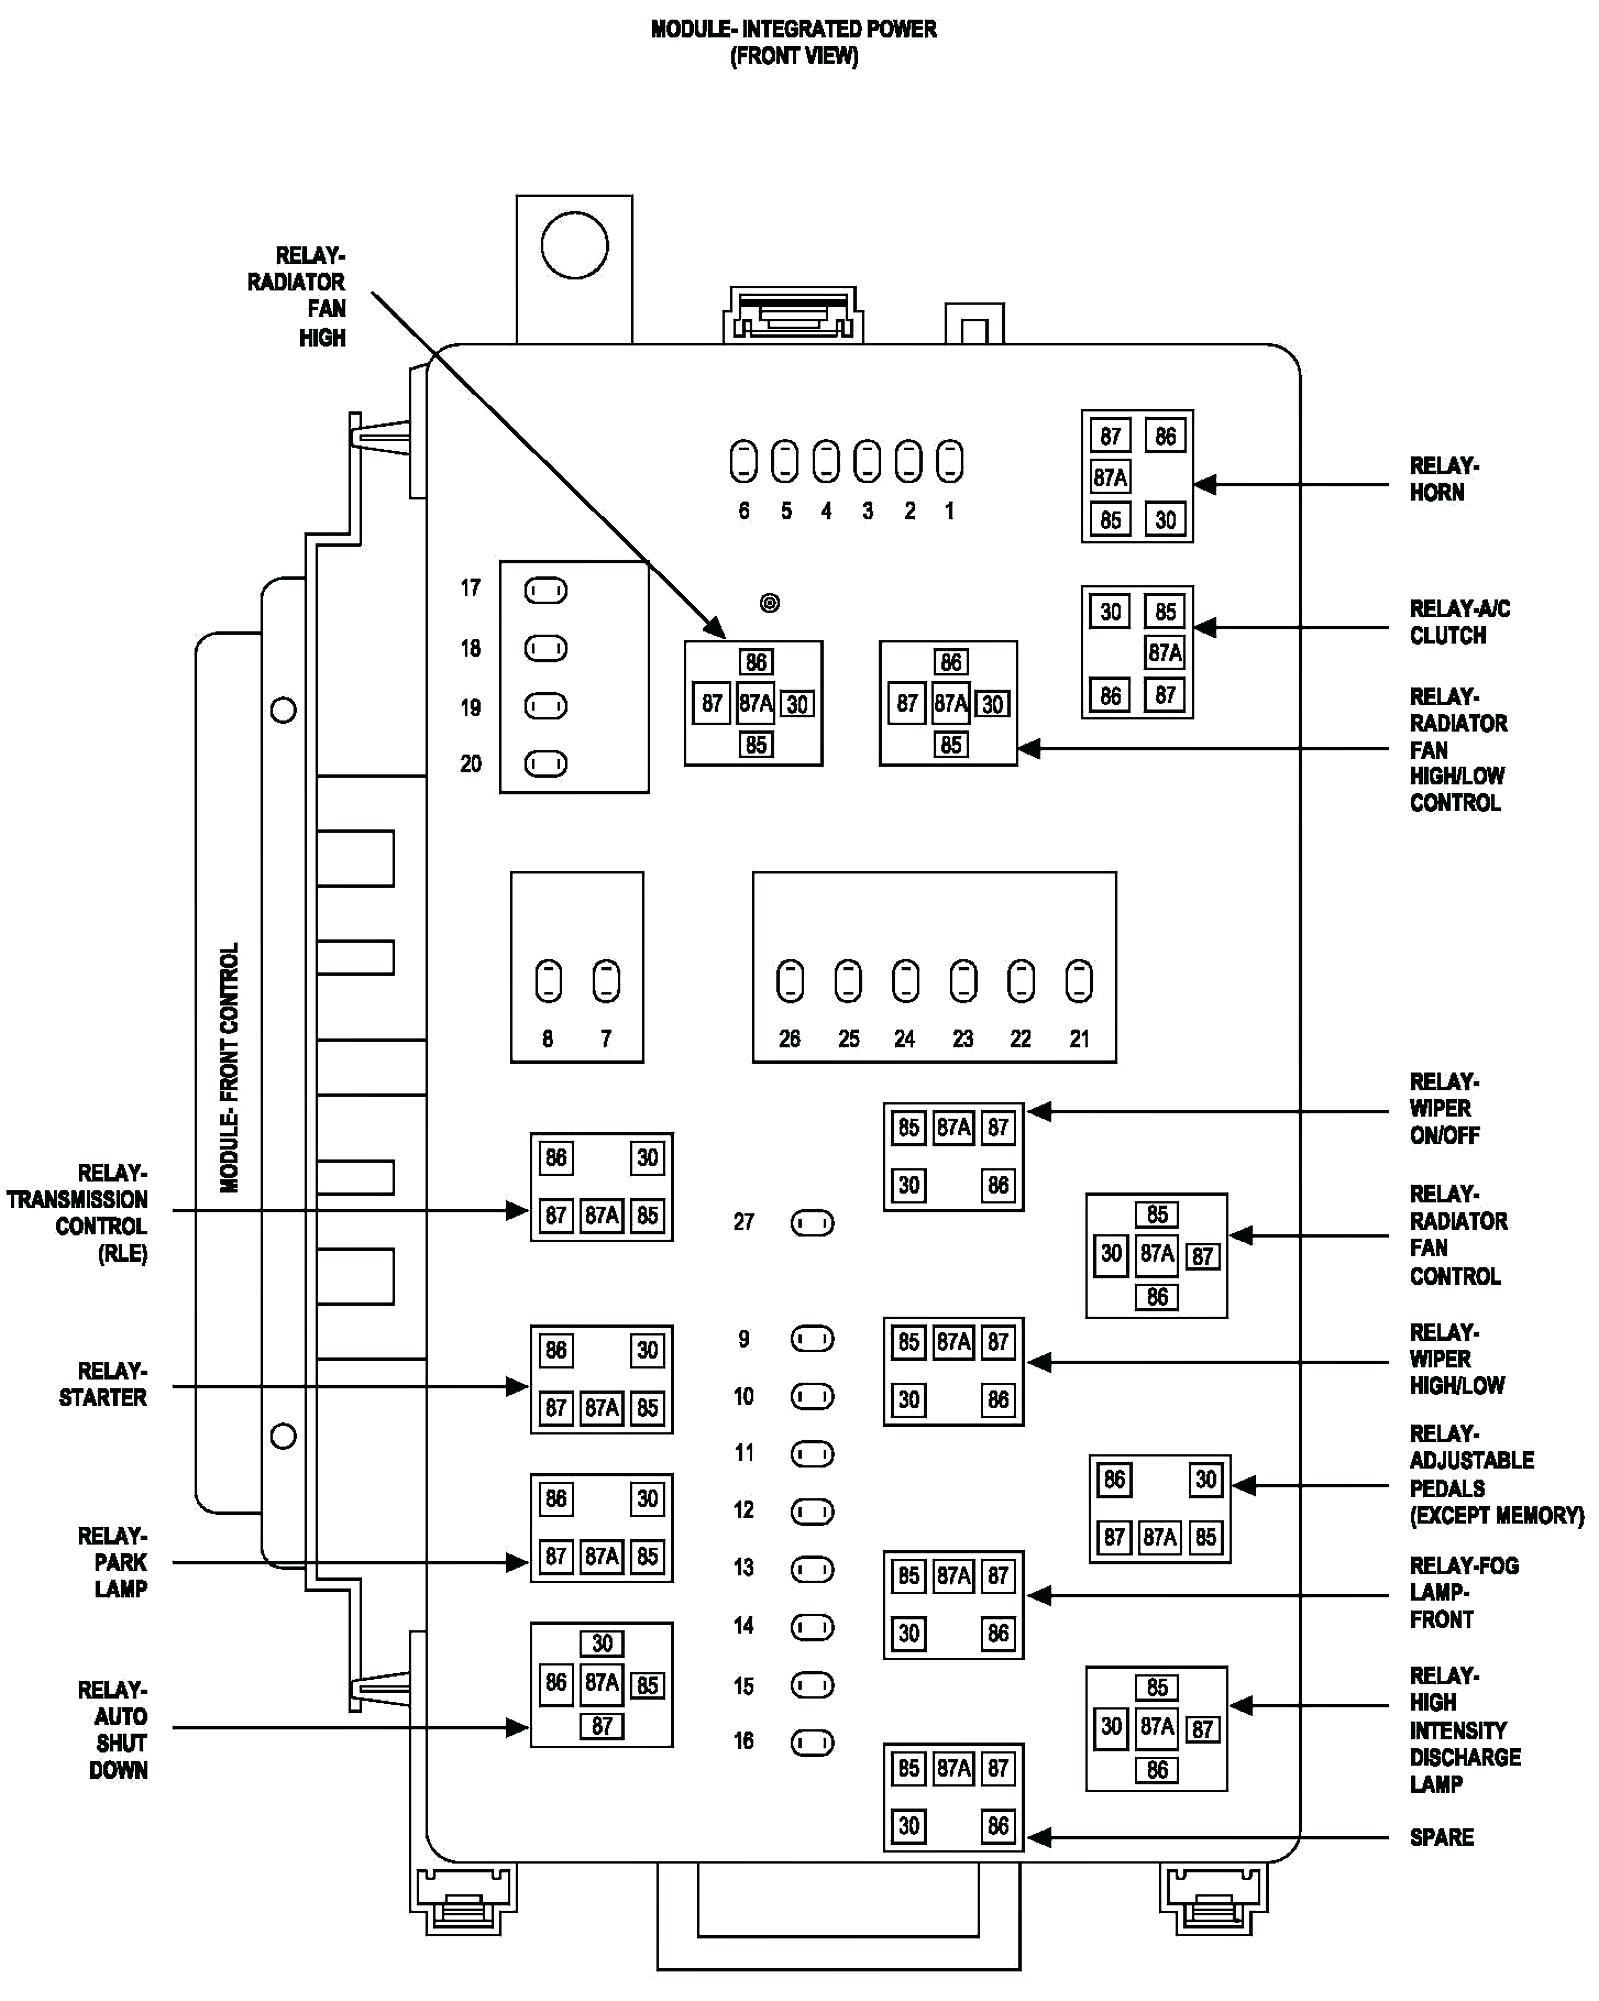 1997 chrysler sebring fuse box wiring diagram description 2011 Dodge Nitro Fuse Box 1998 chrysler concorde fuse box diagram wiring diagram description dodge nitro fuse box 1997 chrysler sebring fuse box